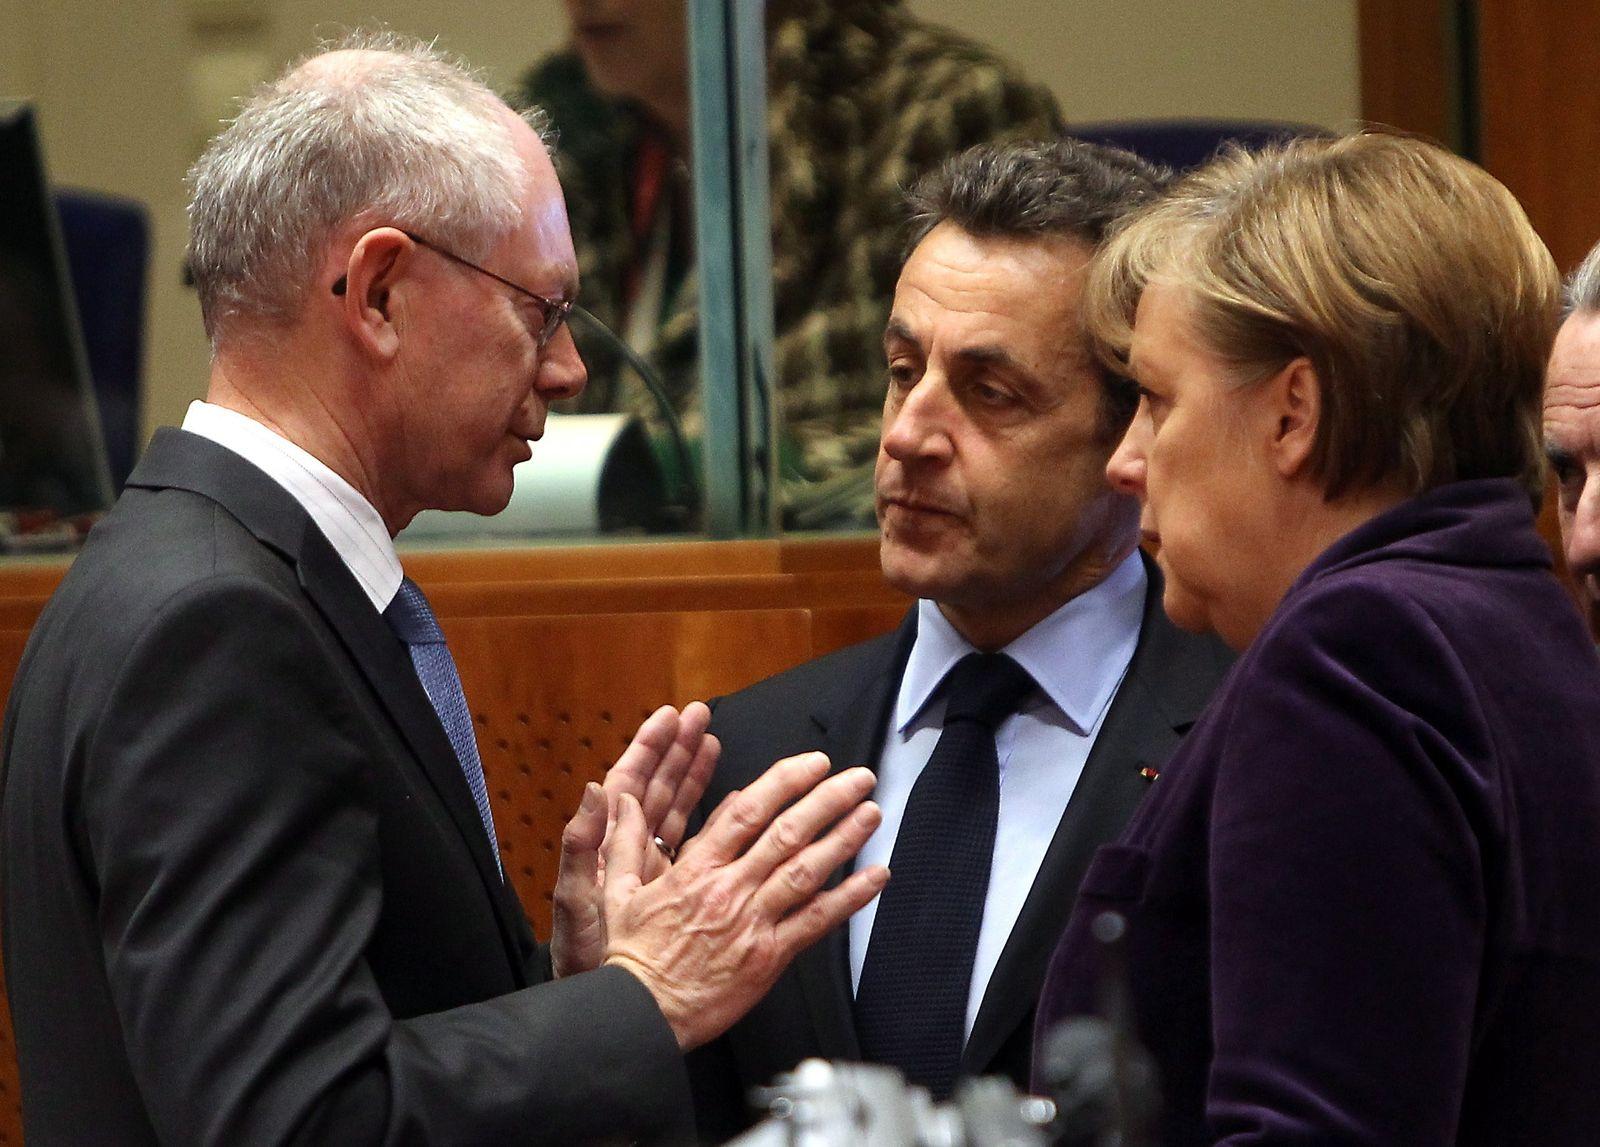 Merkel/ Sarkozy/ Van Rompuy